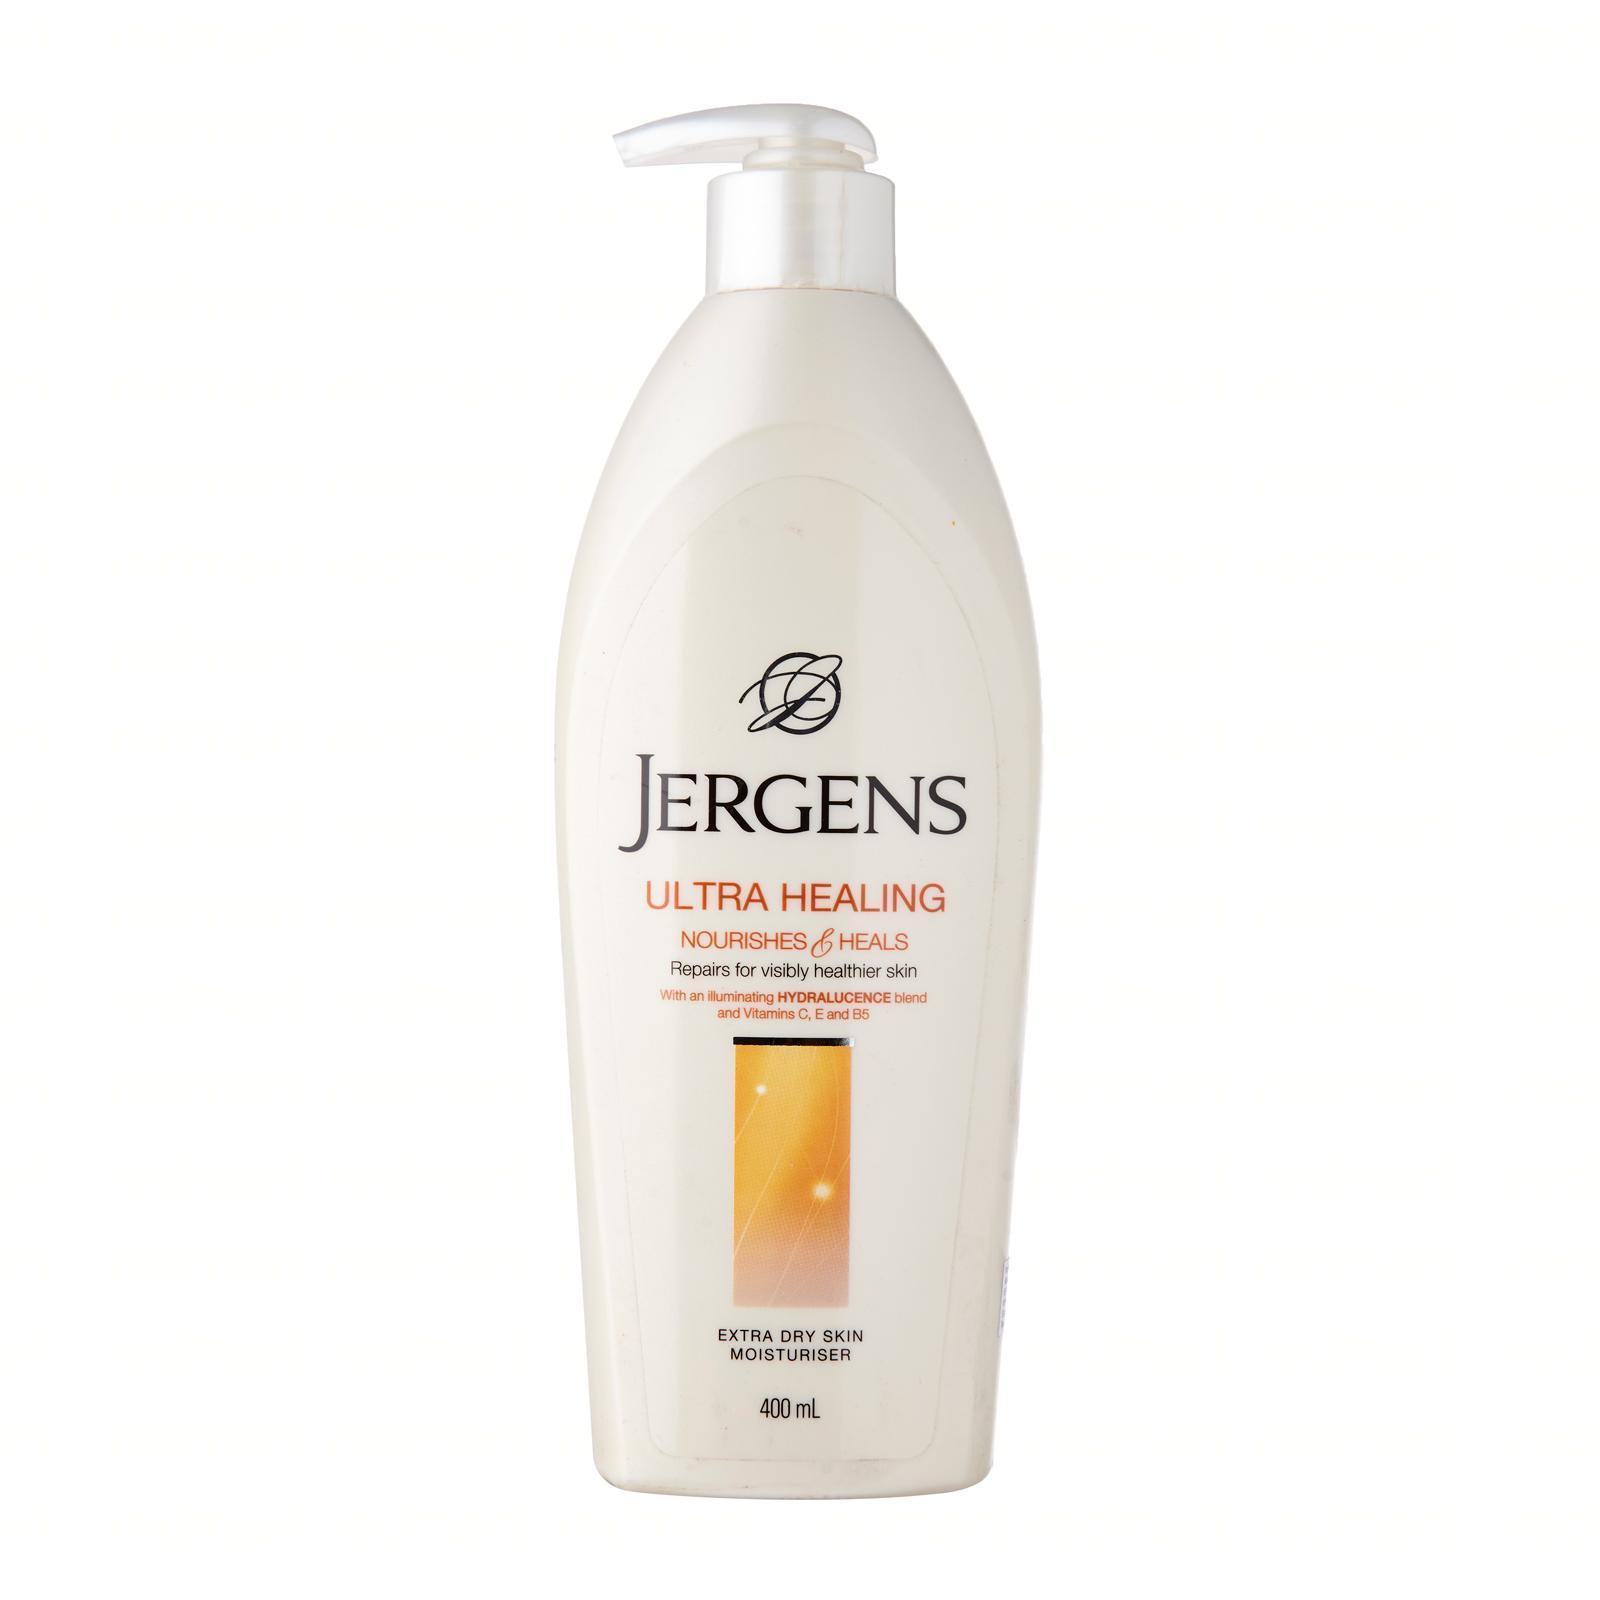 Jergens Ultra Healing Nourishes & Heals Extra Dry Skin Moisturiser